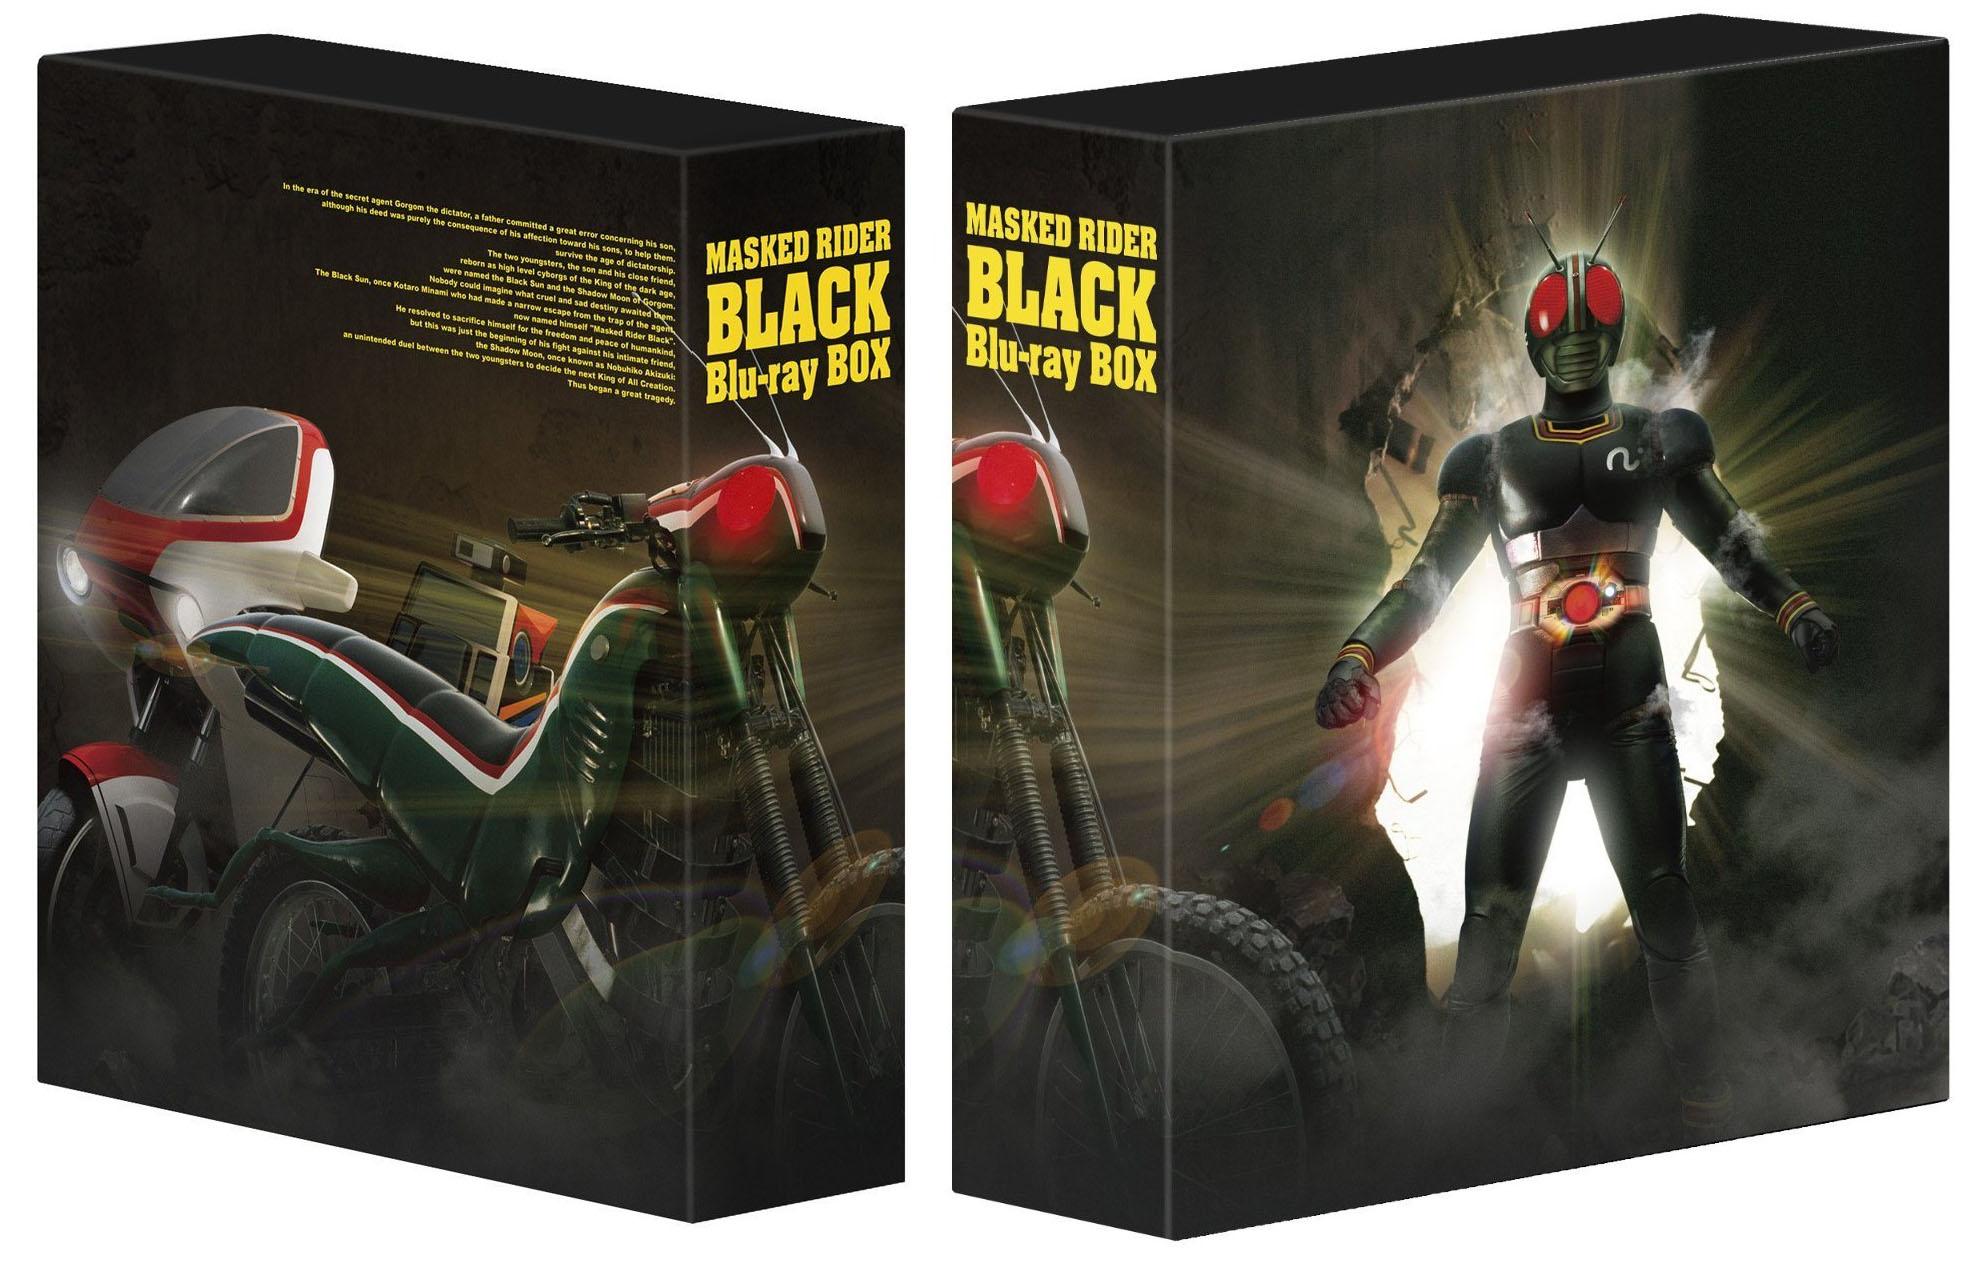 Kamen Rider Black - Blu-Ray Box 1 Set Jacket Cover Revealed